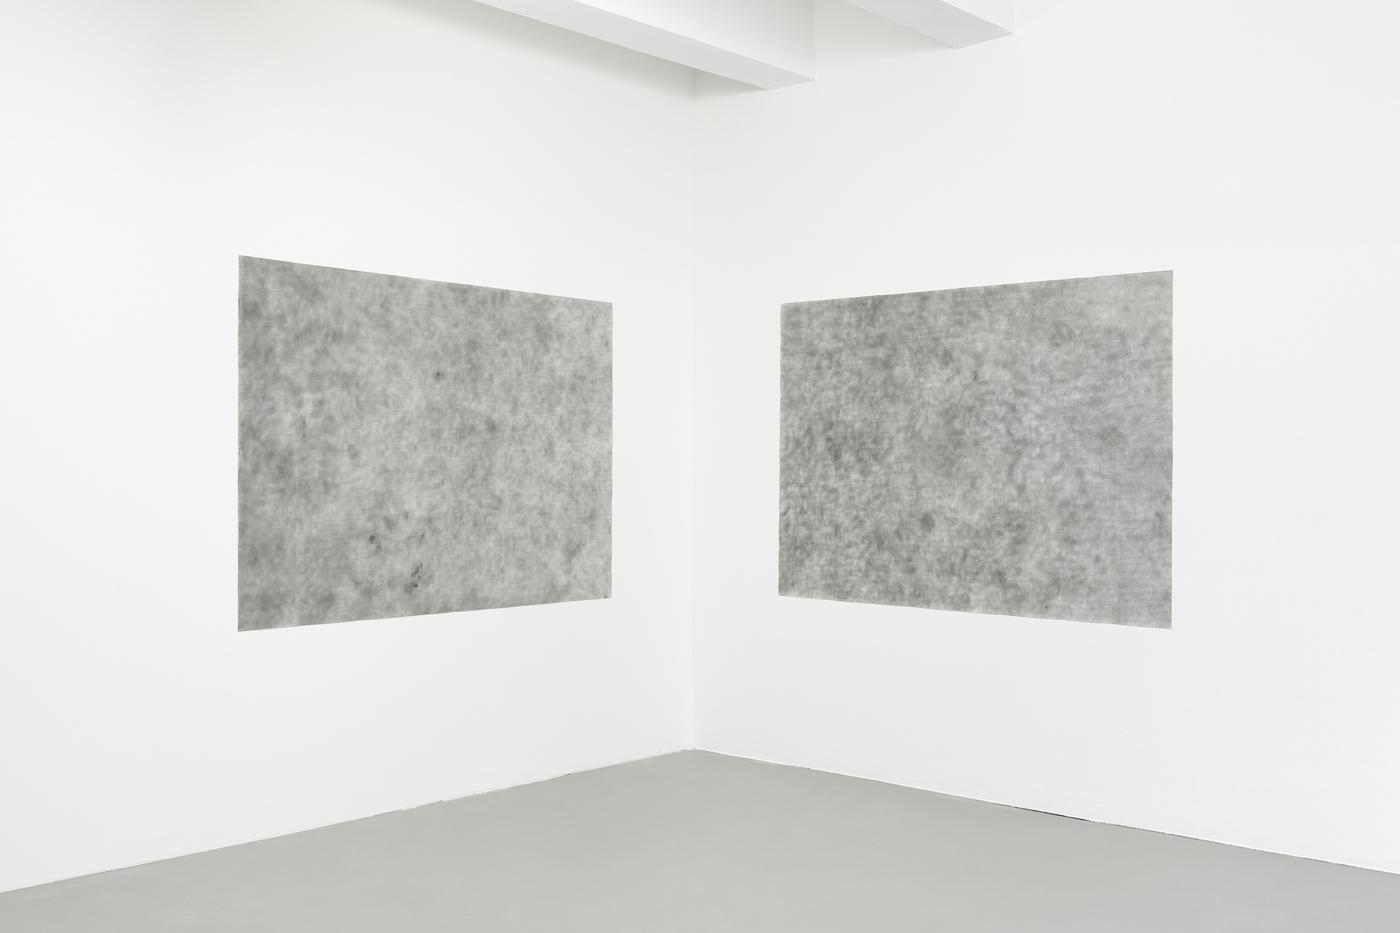 MatthiasRuthenberg-aHardRainSaGonnaFall